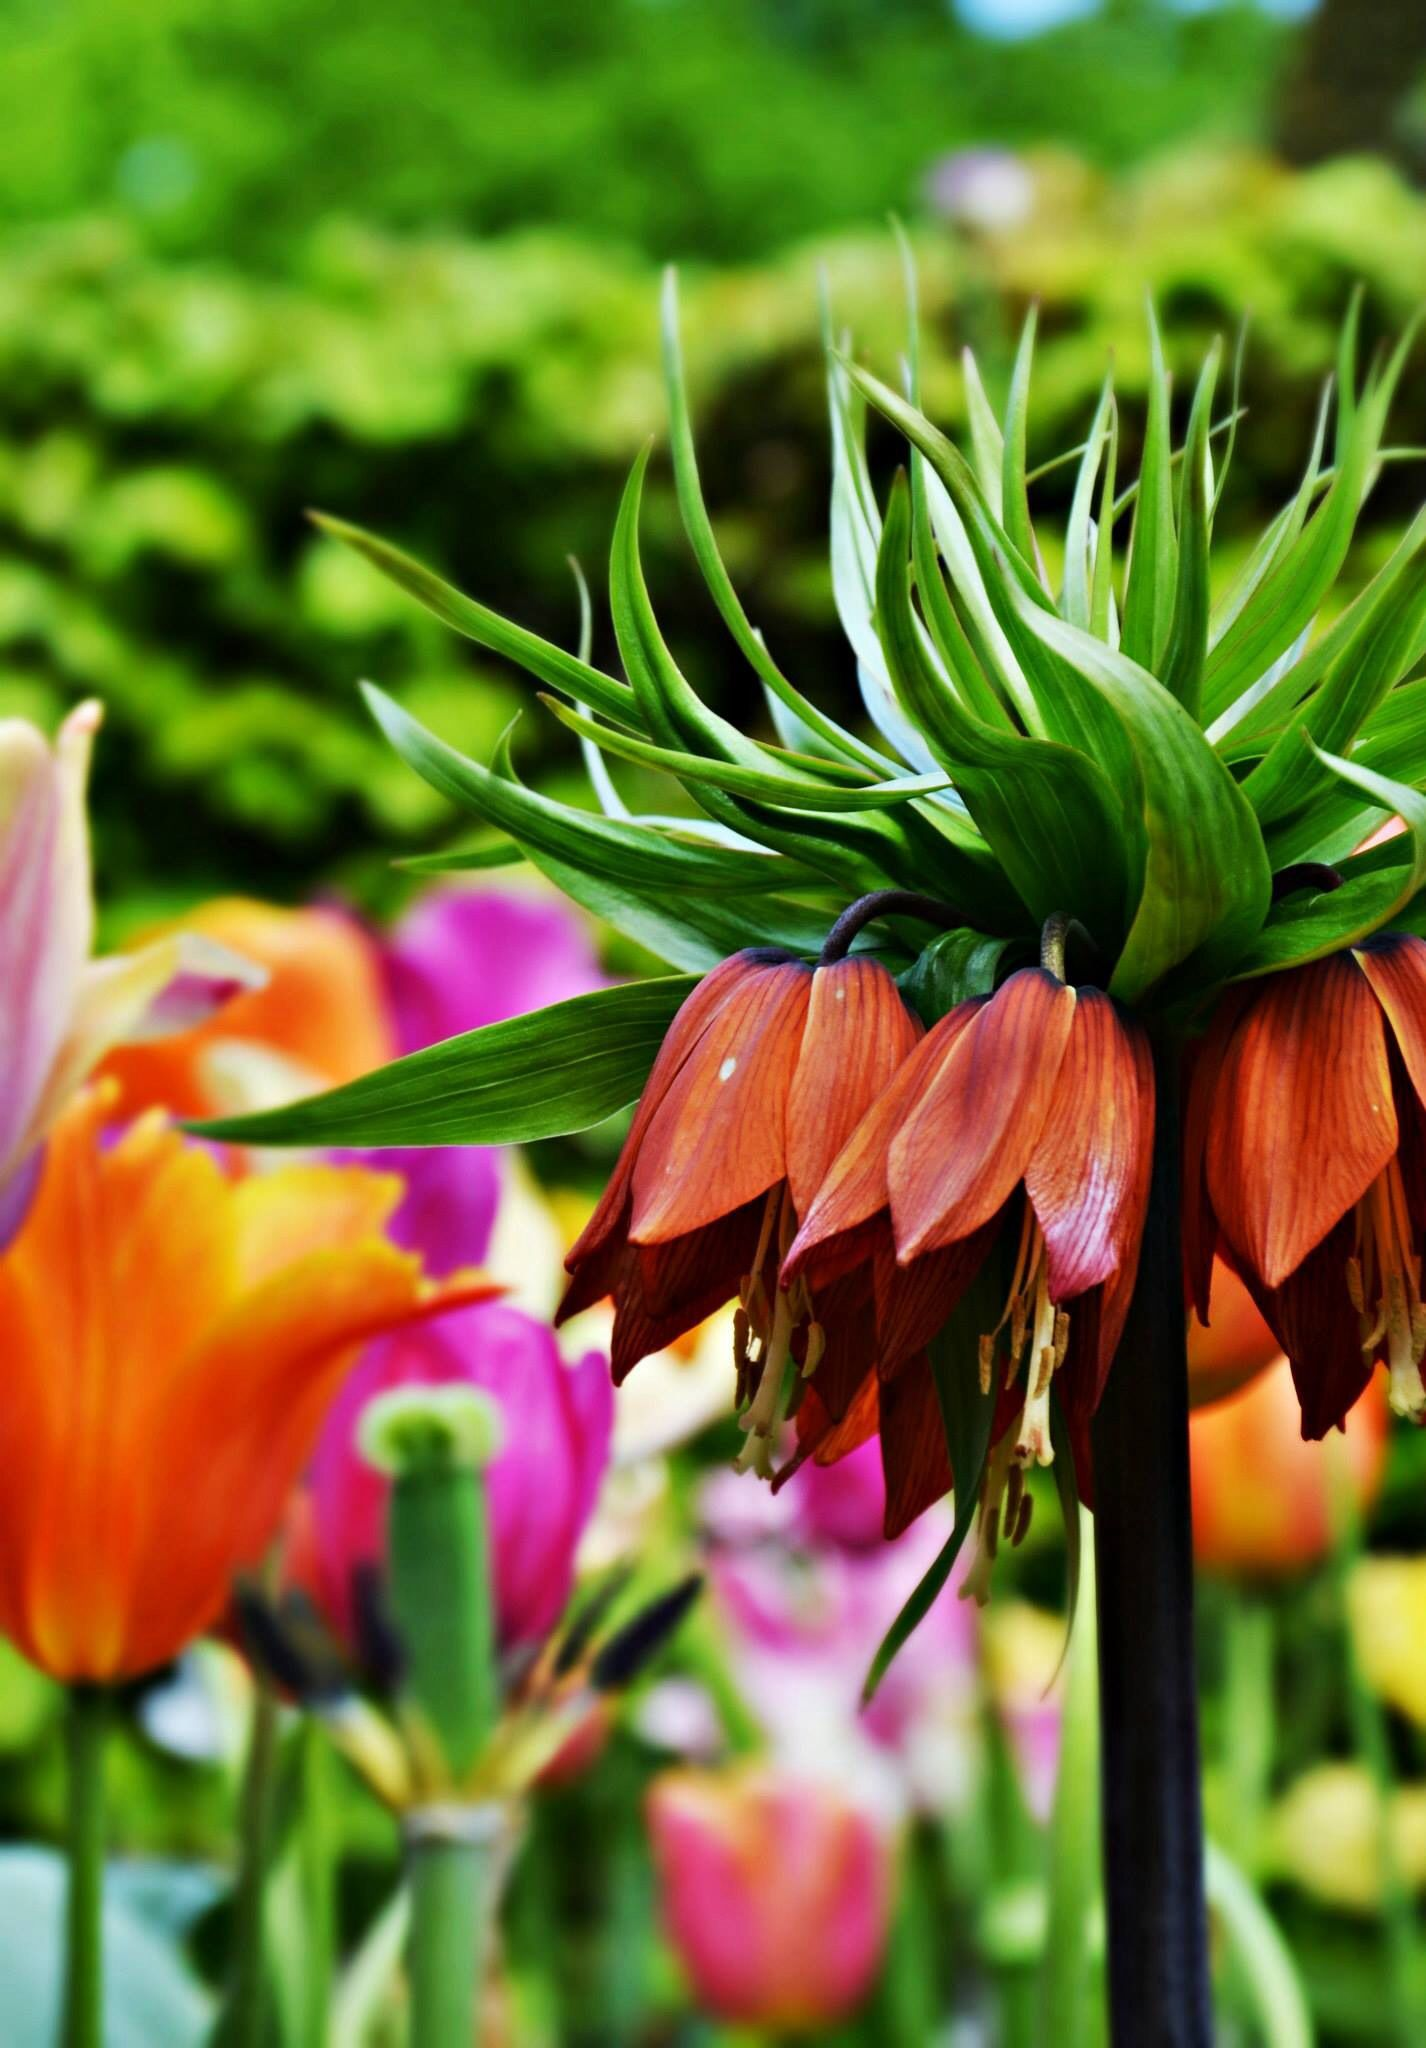 Interessantste blom ooit ...